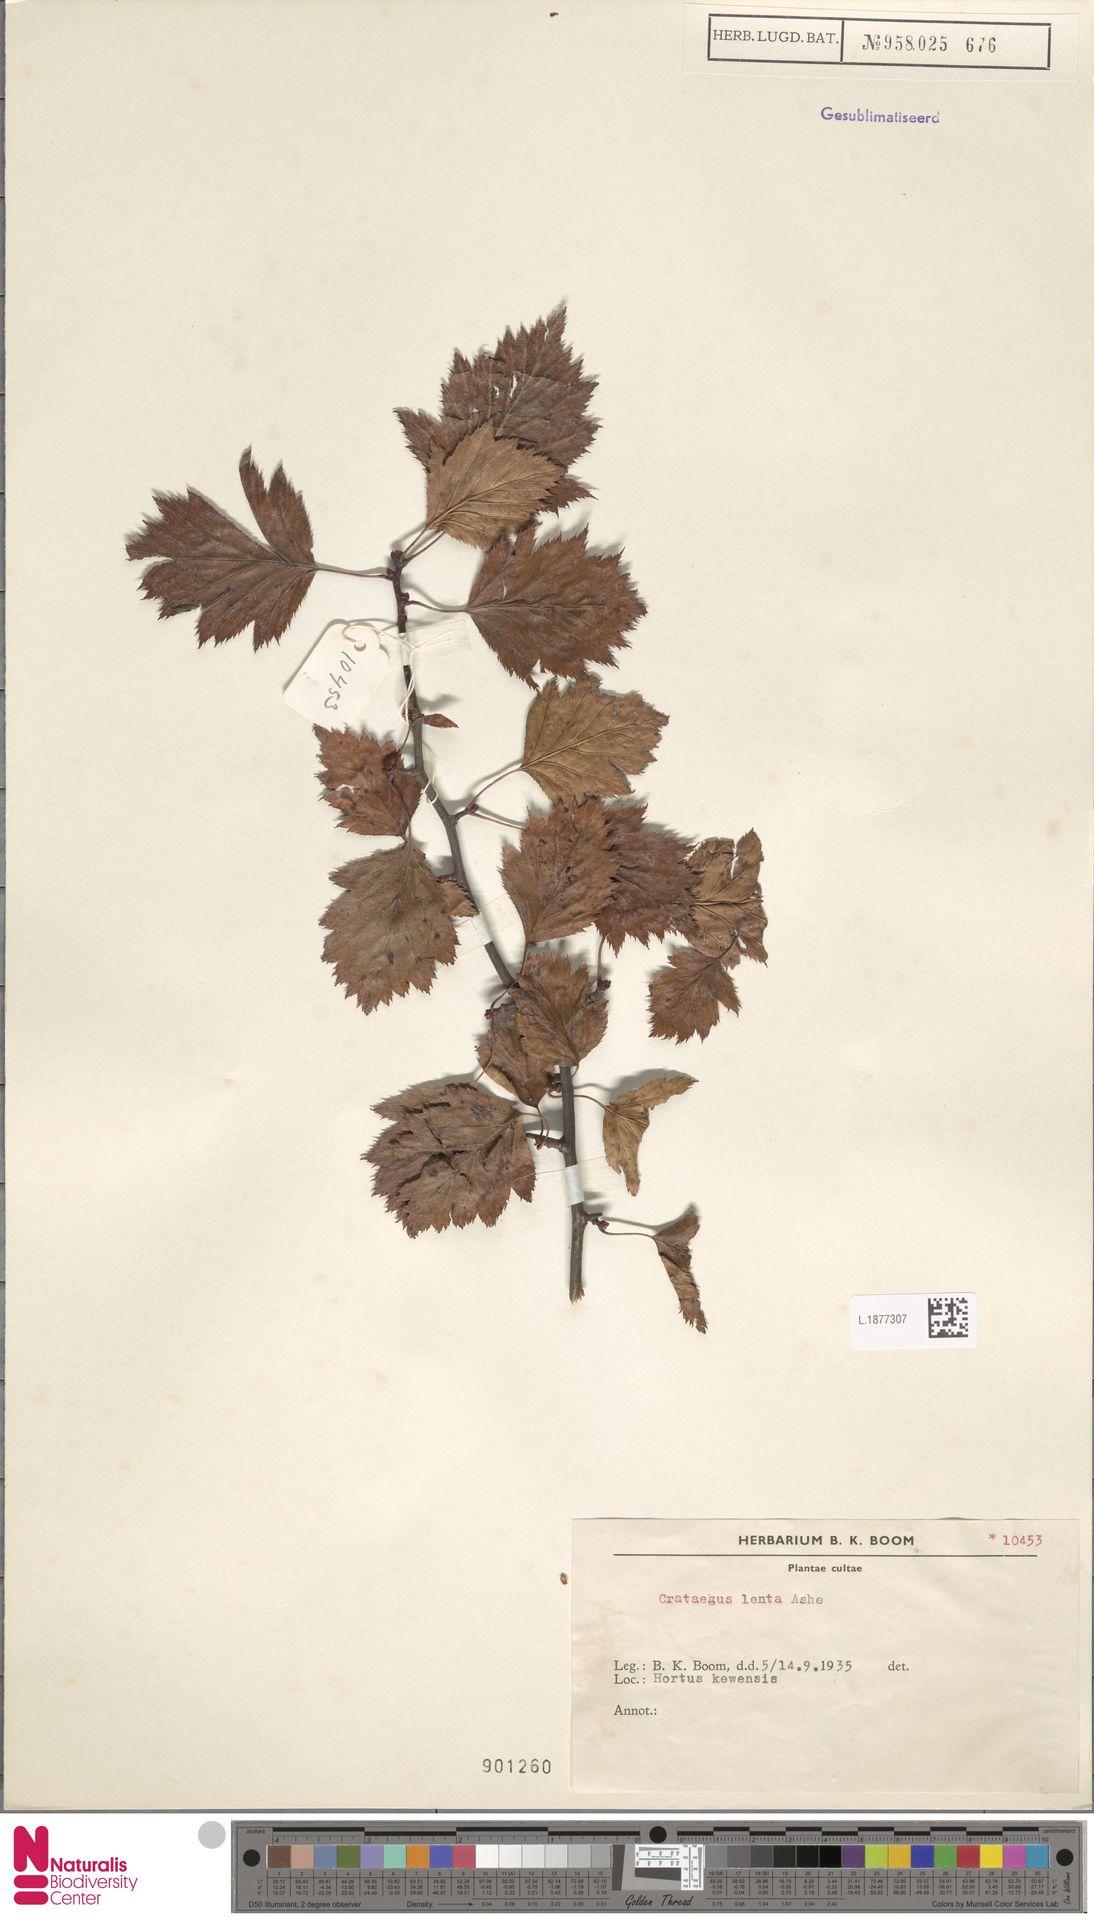 L.1877307   Crataegus lenta Ashe